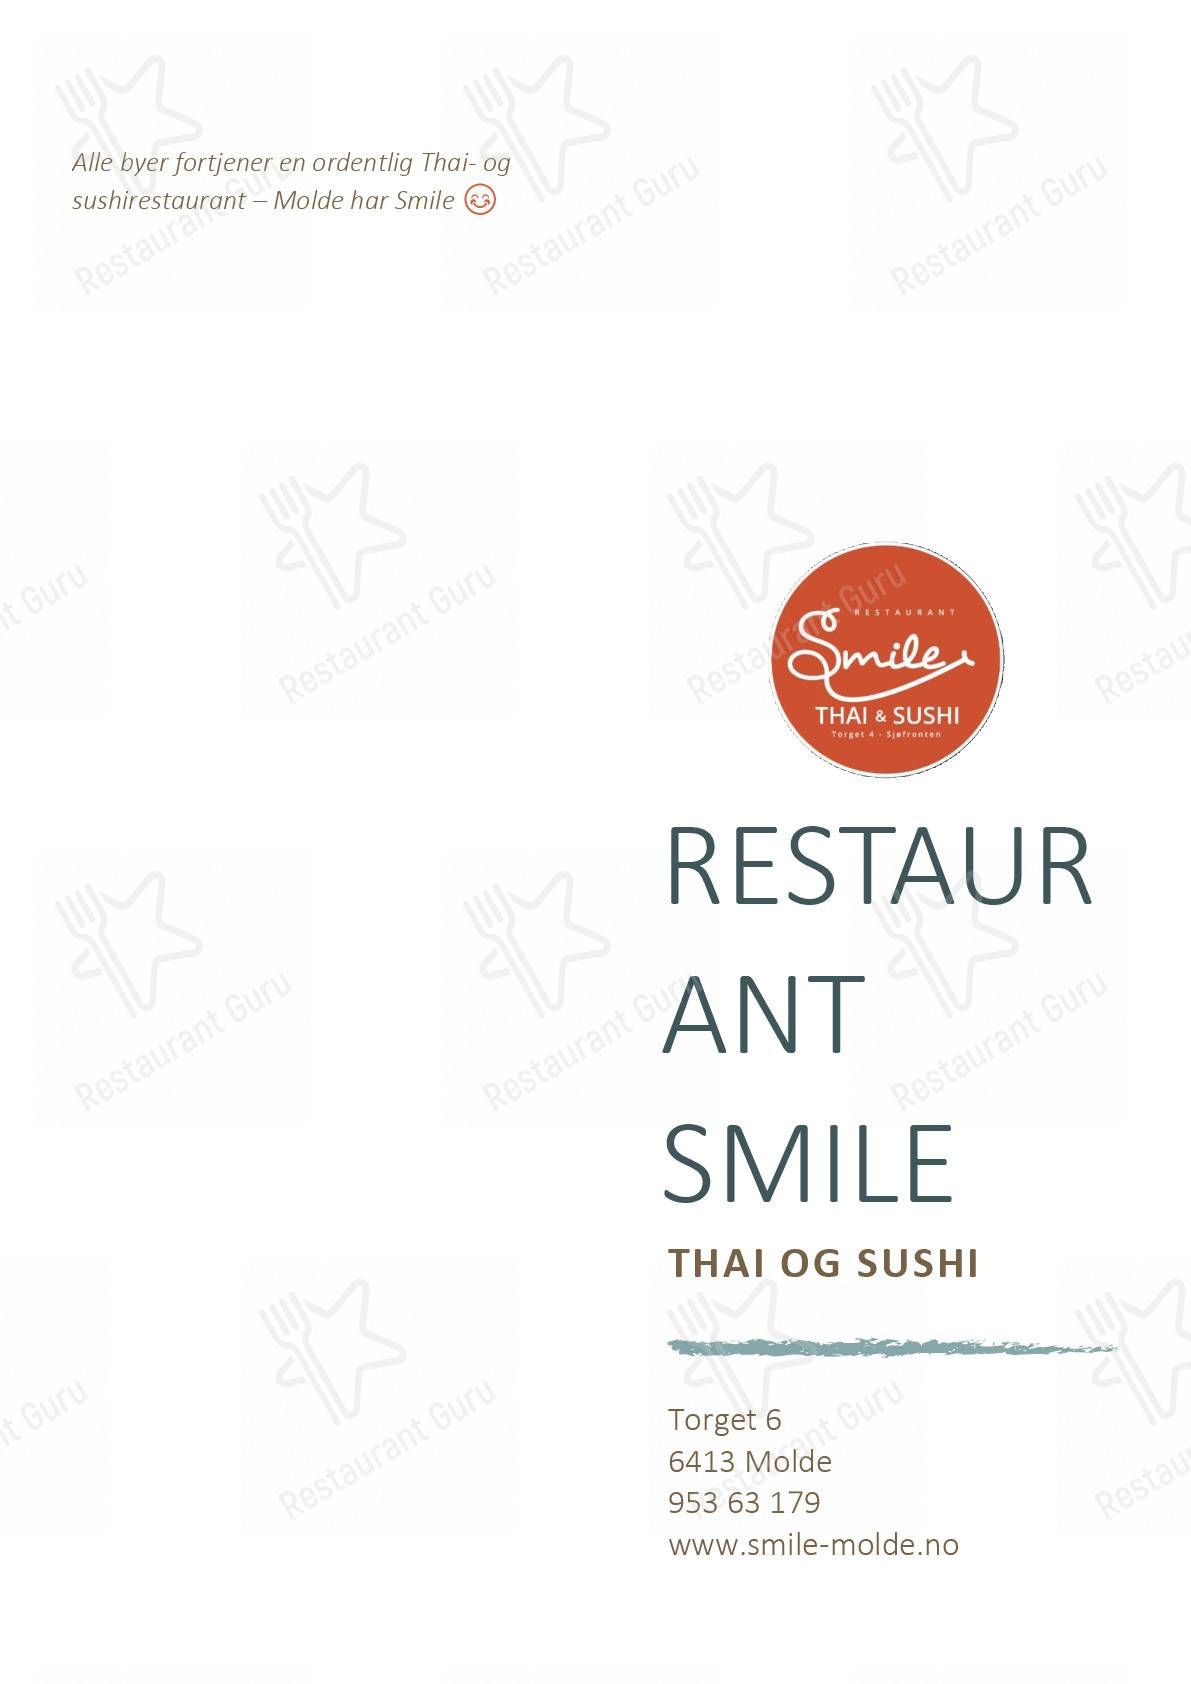 Restaurant Smile menu - meals and drinks